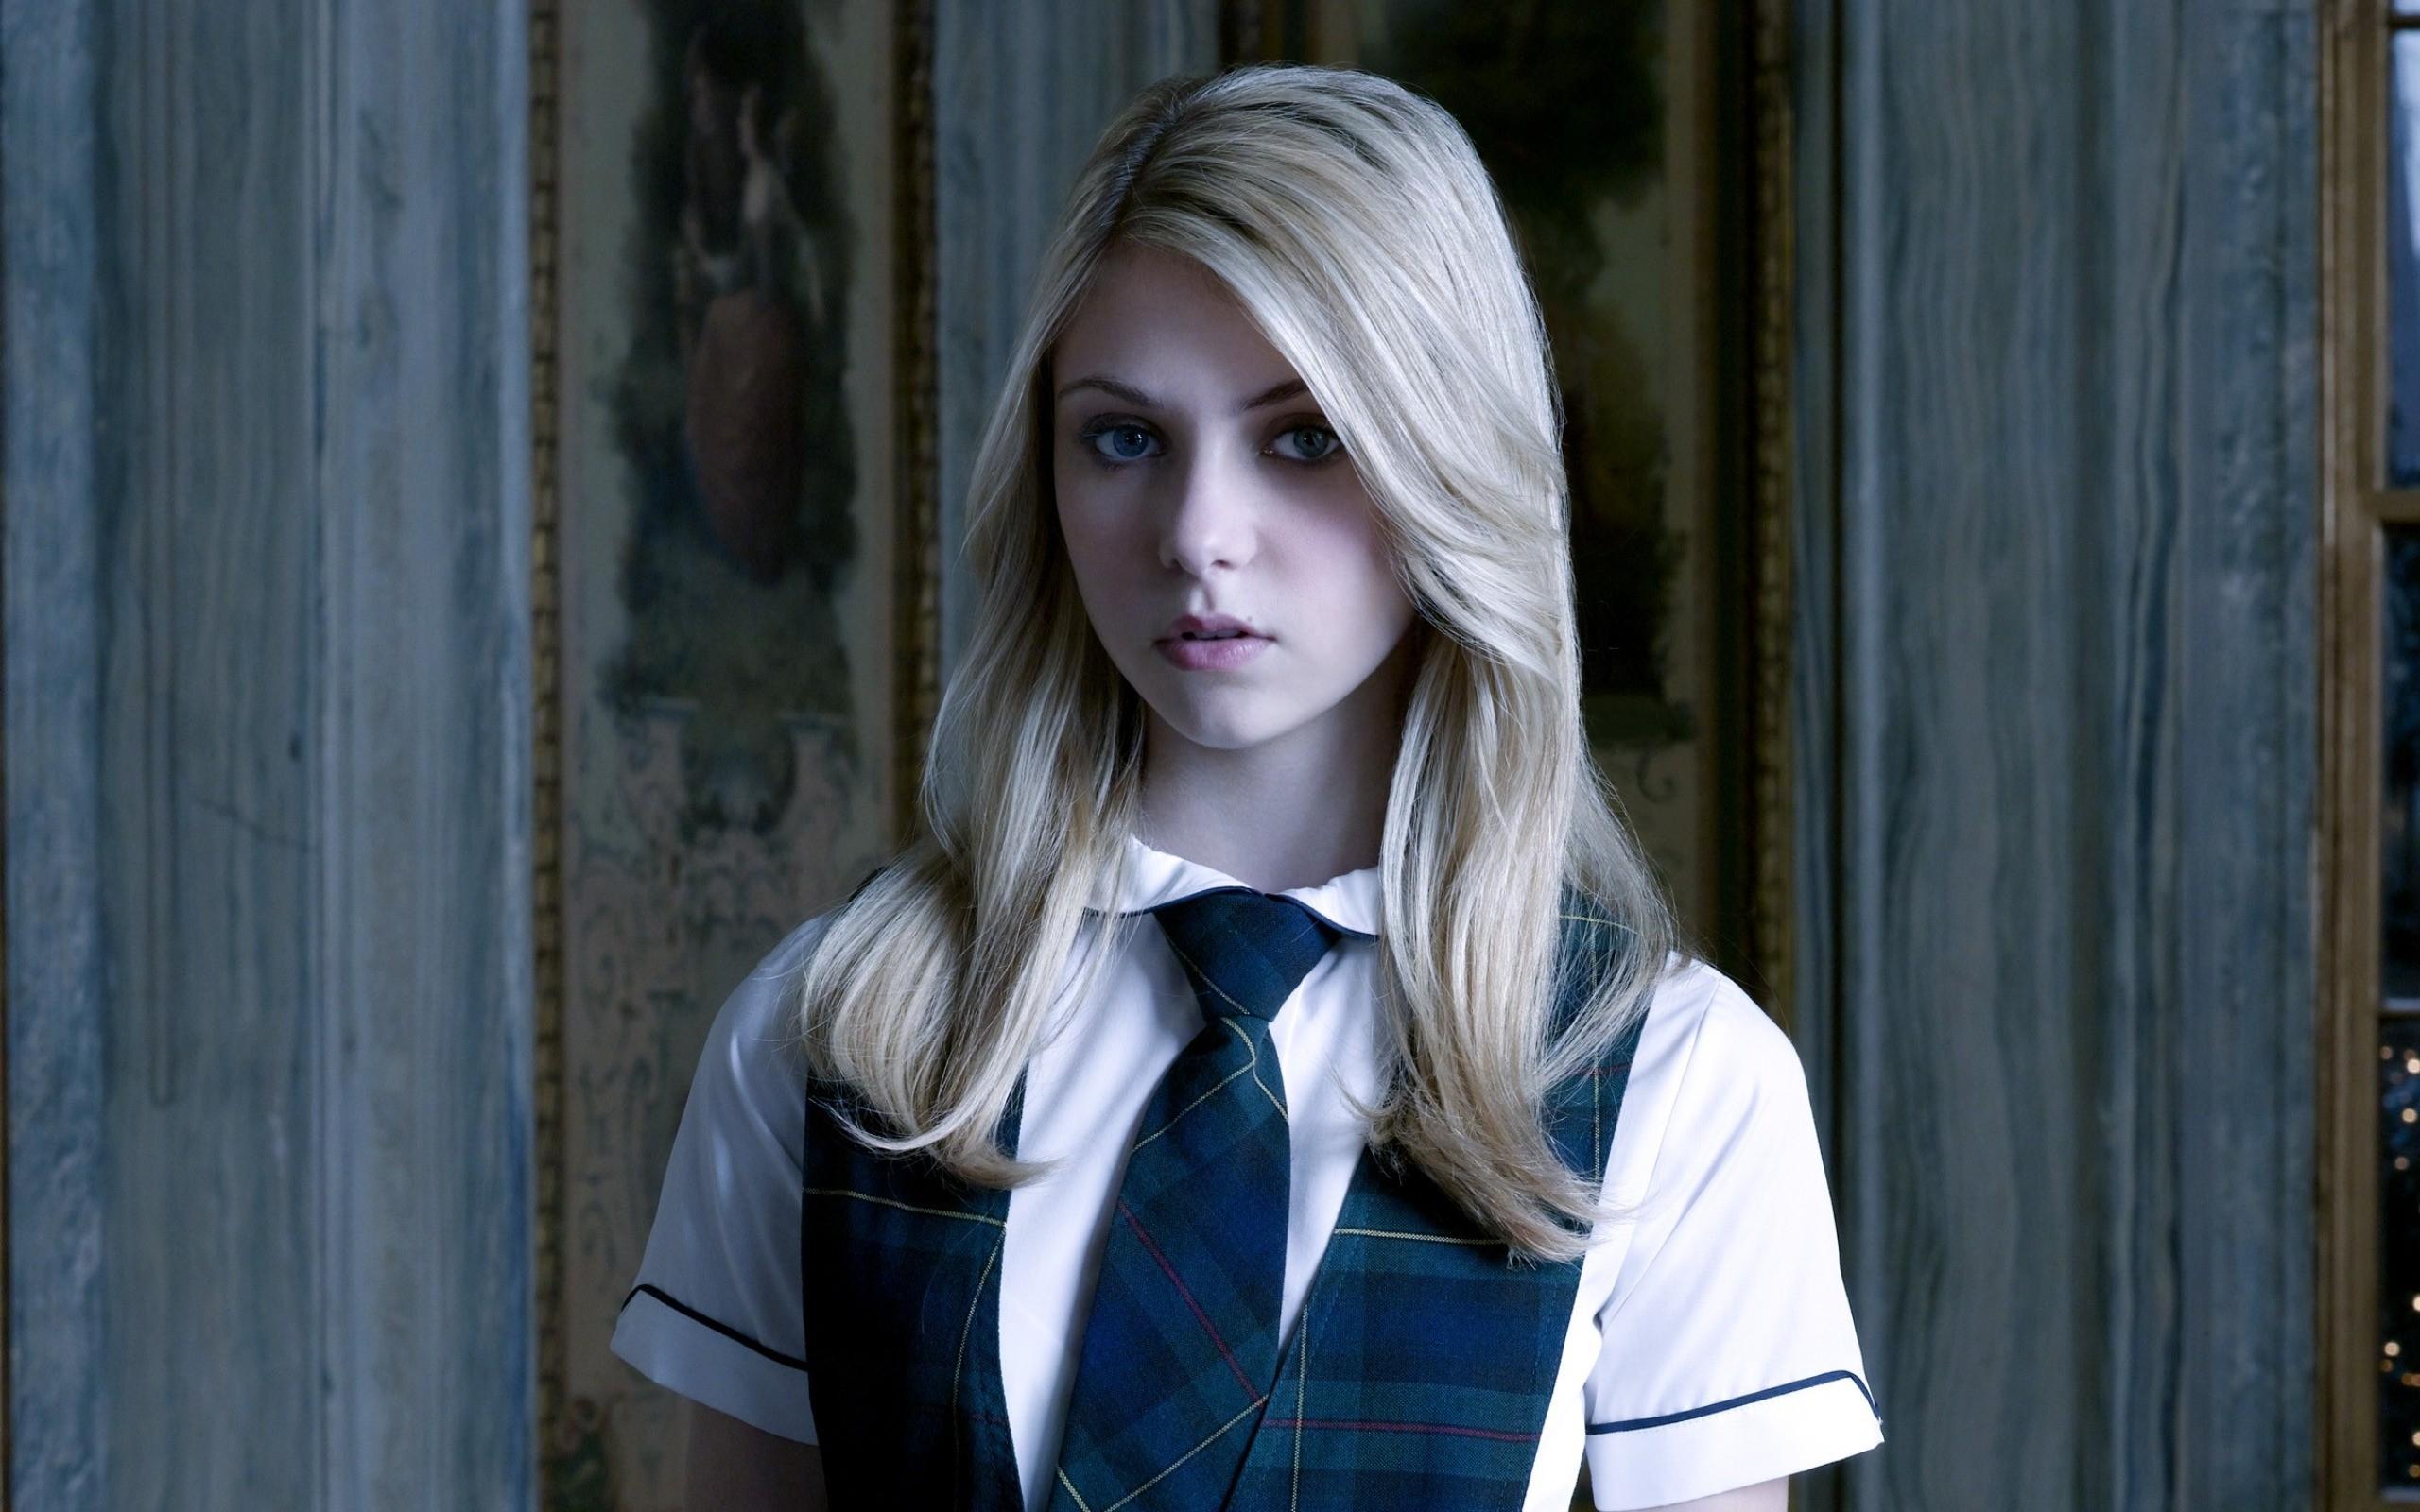 Beautiful blonde Girl   2560 x 1600   Download   Close